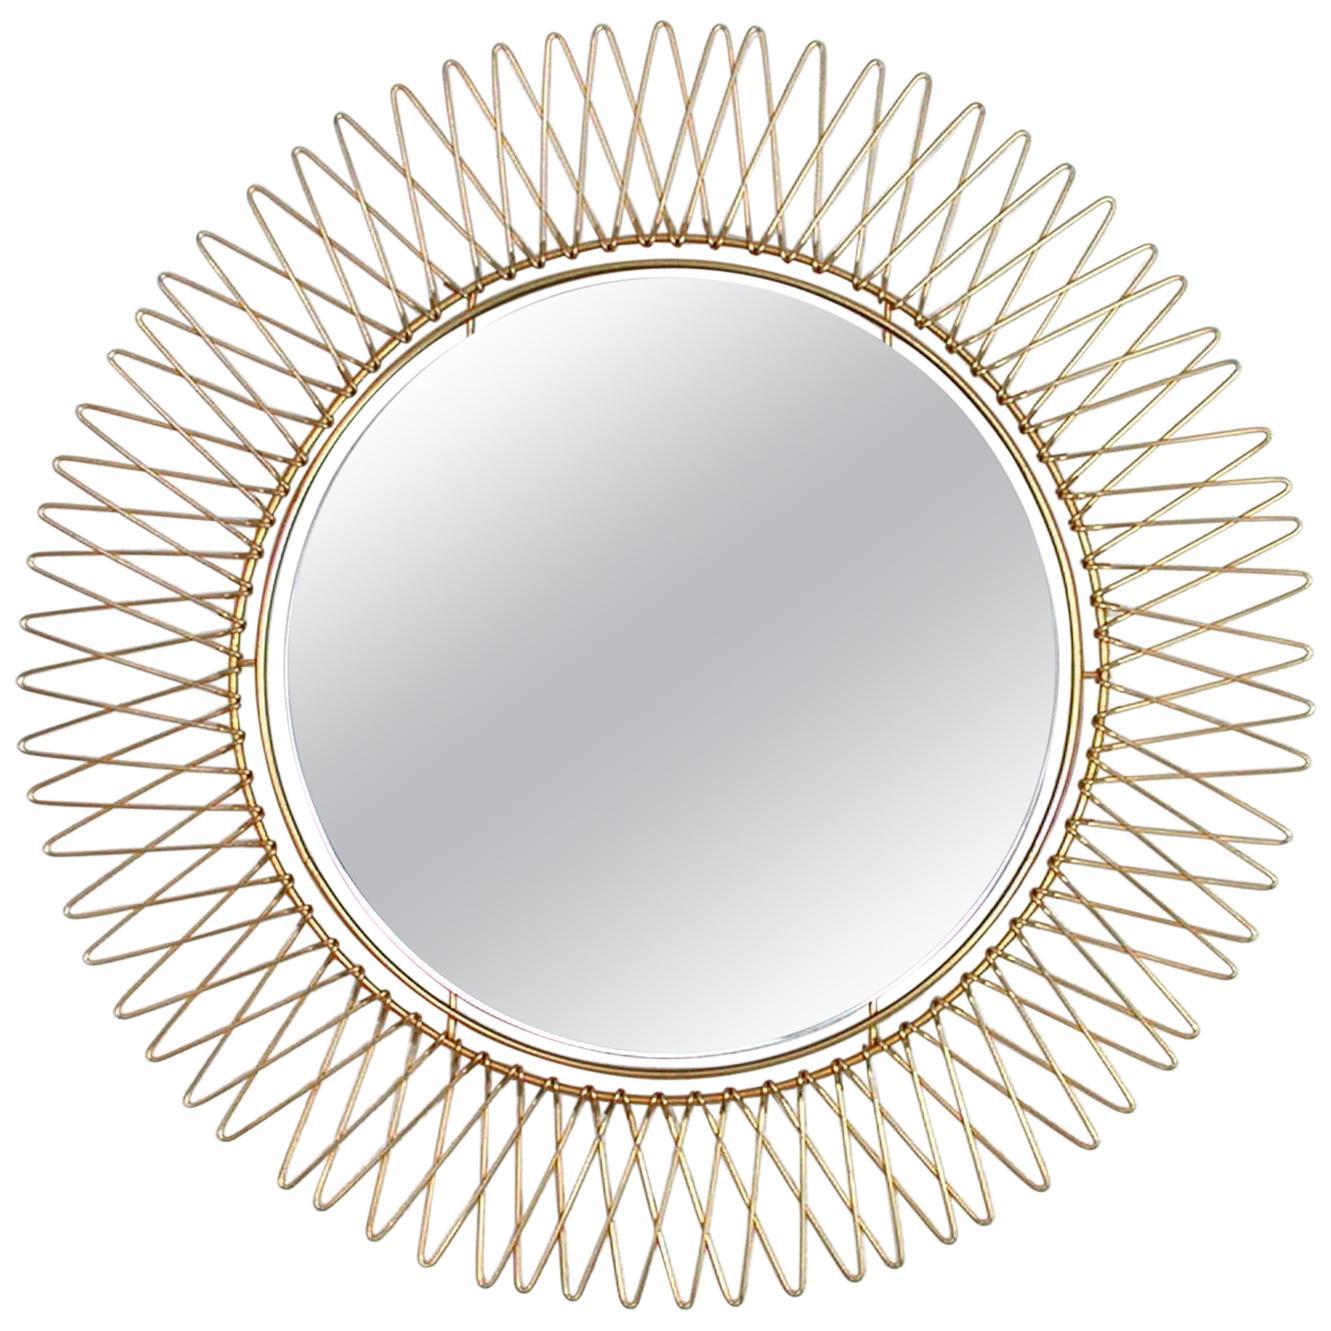 Midcentury French Brass Sunburst Wall Mirror, 1950s